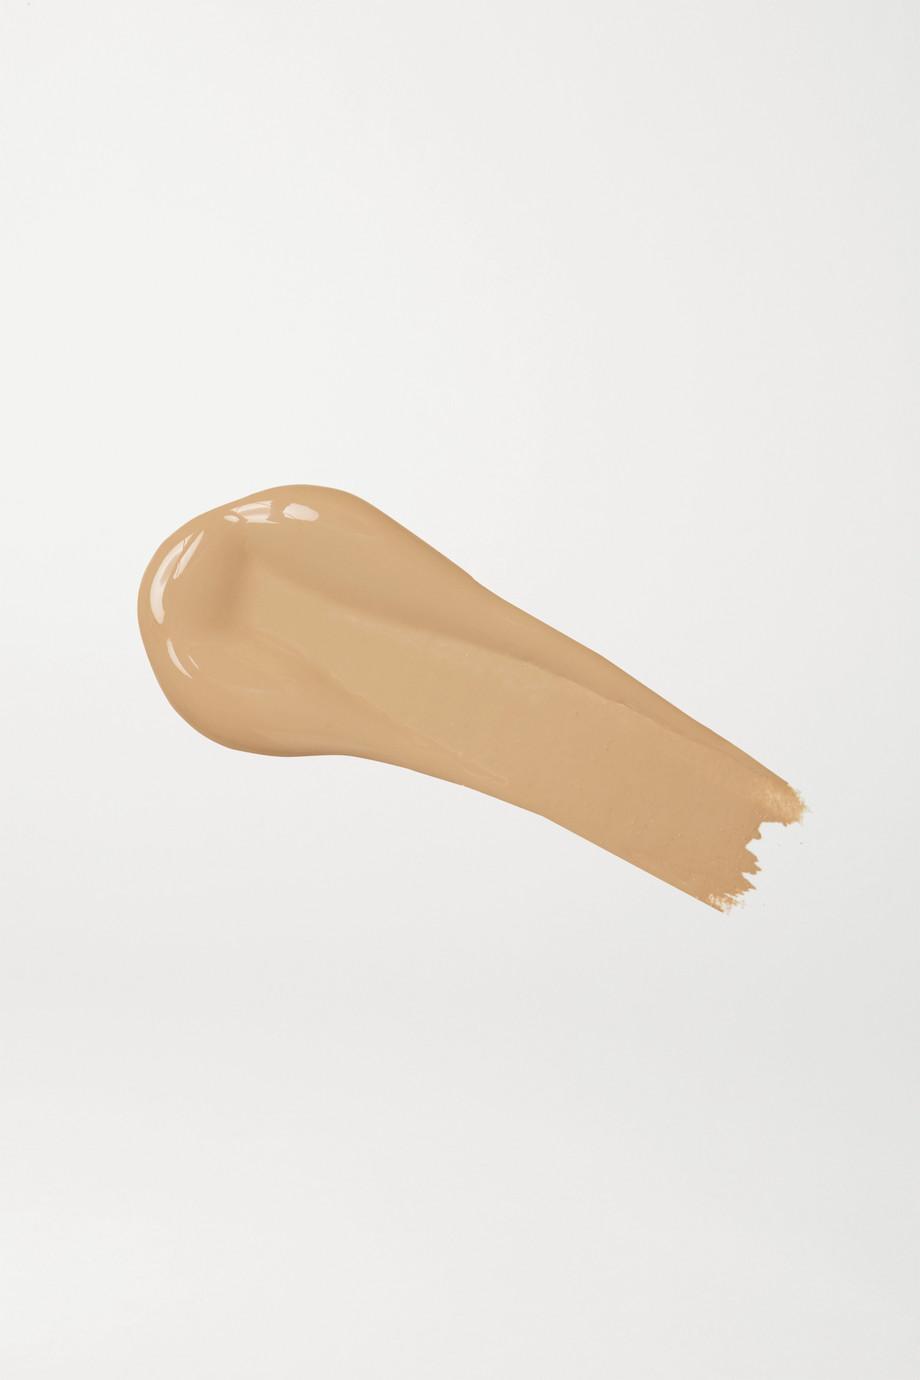 Kosas Revealer Super Creamy + Brightening Concealer - 06